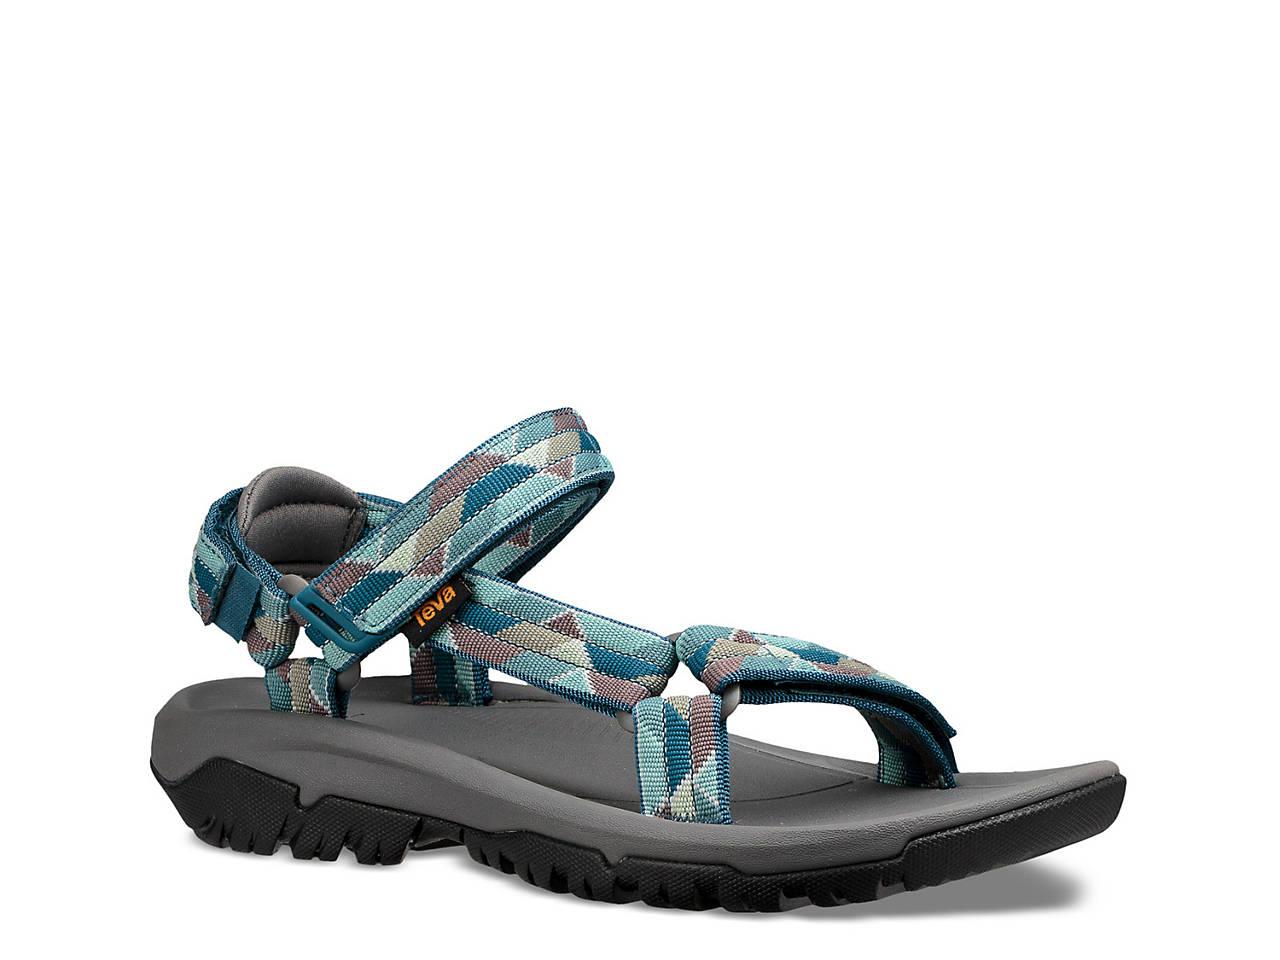 Teva Ouragan Xlt 2 Sandale Active (des Femmes) Choisir Une Meilleure Vente NkTlbeXA